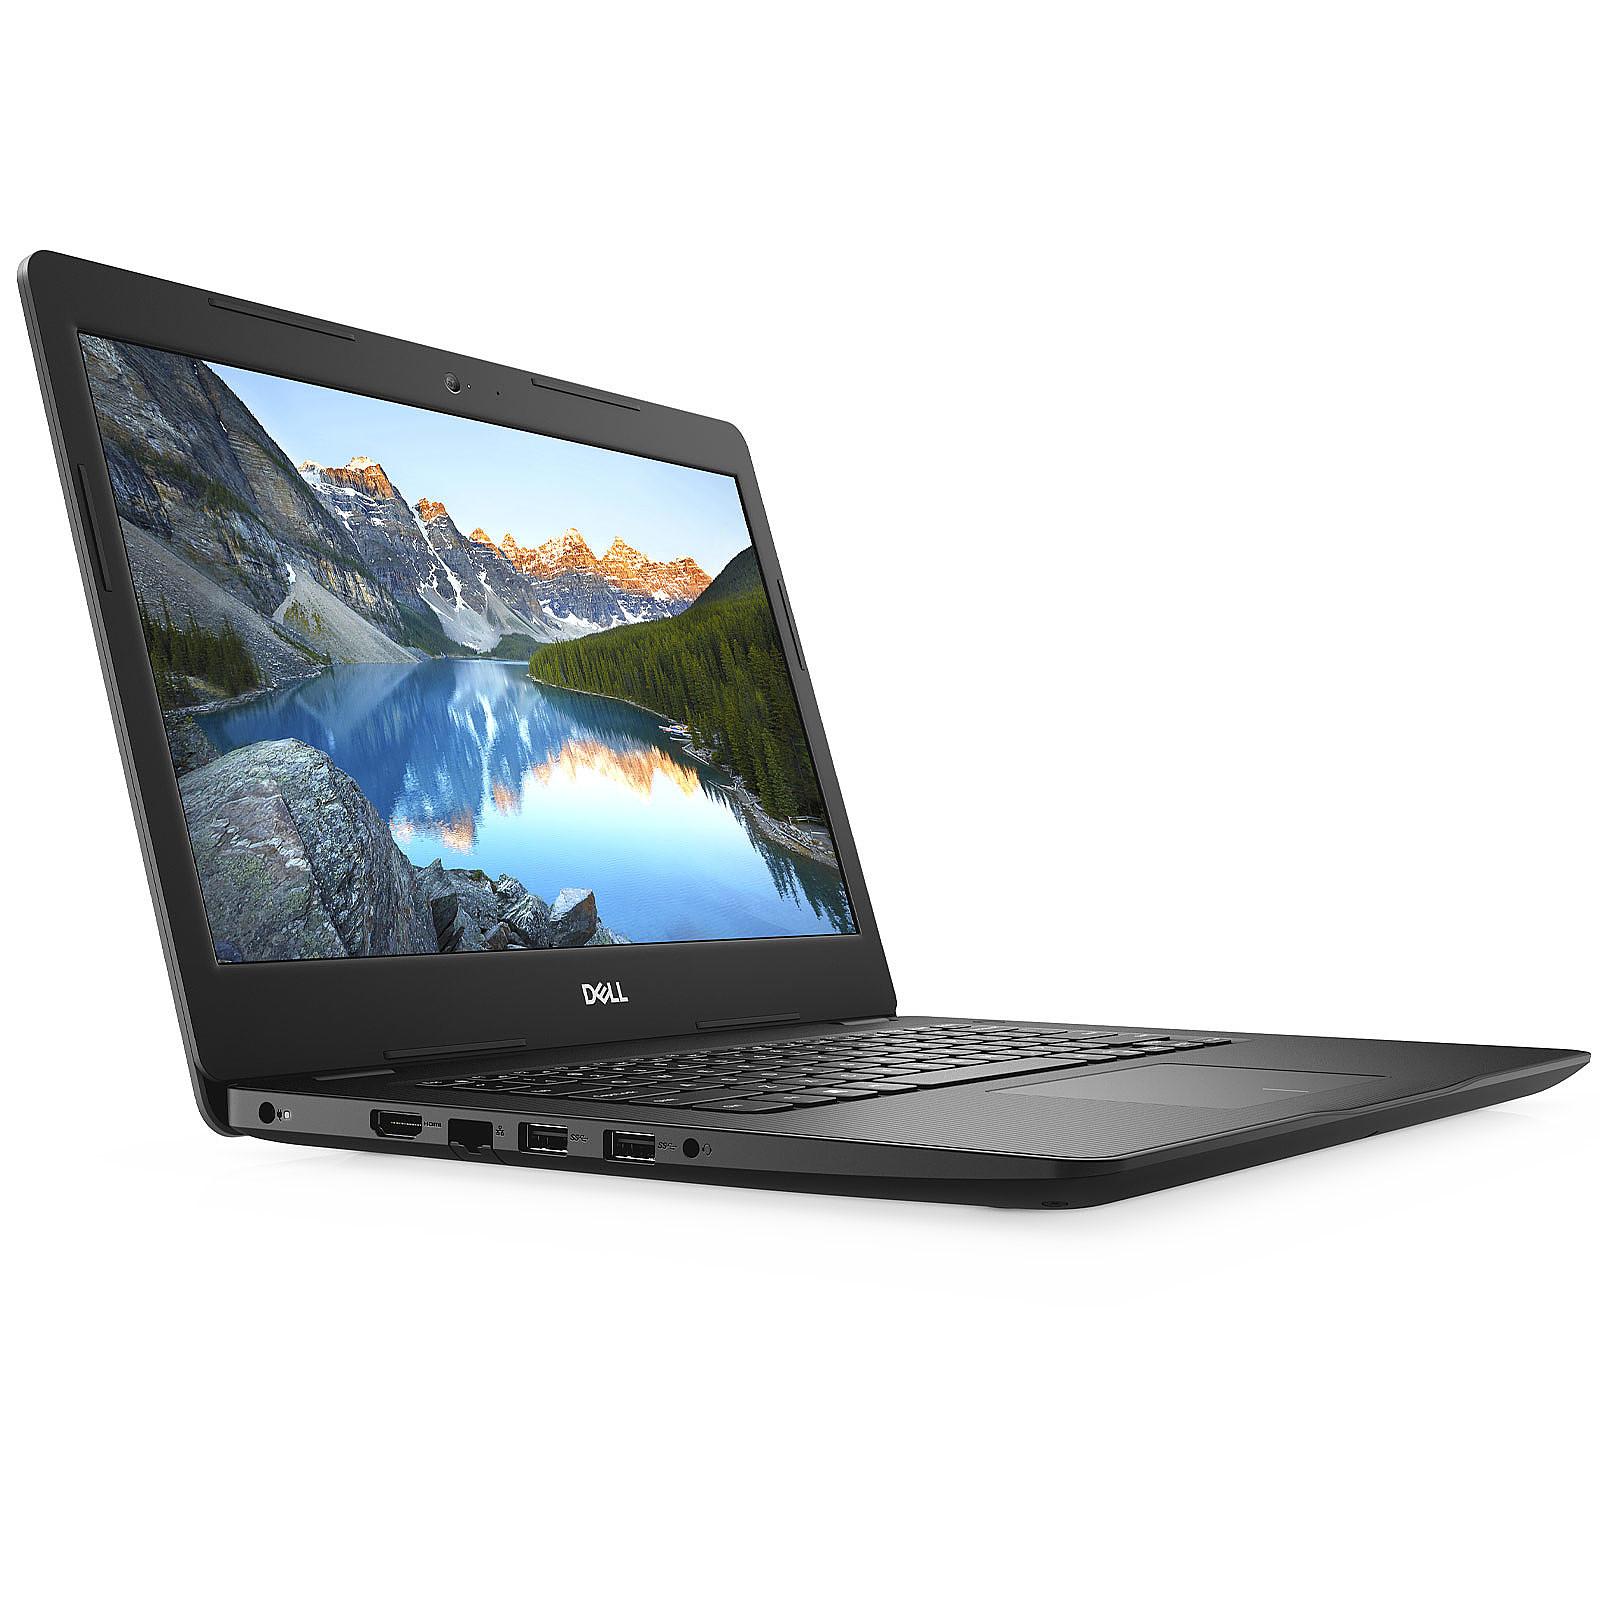 Dell Inspiron 14 3481 (VP02R)